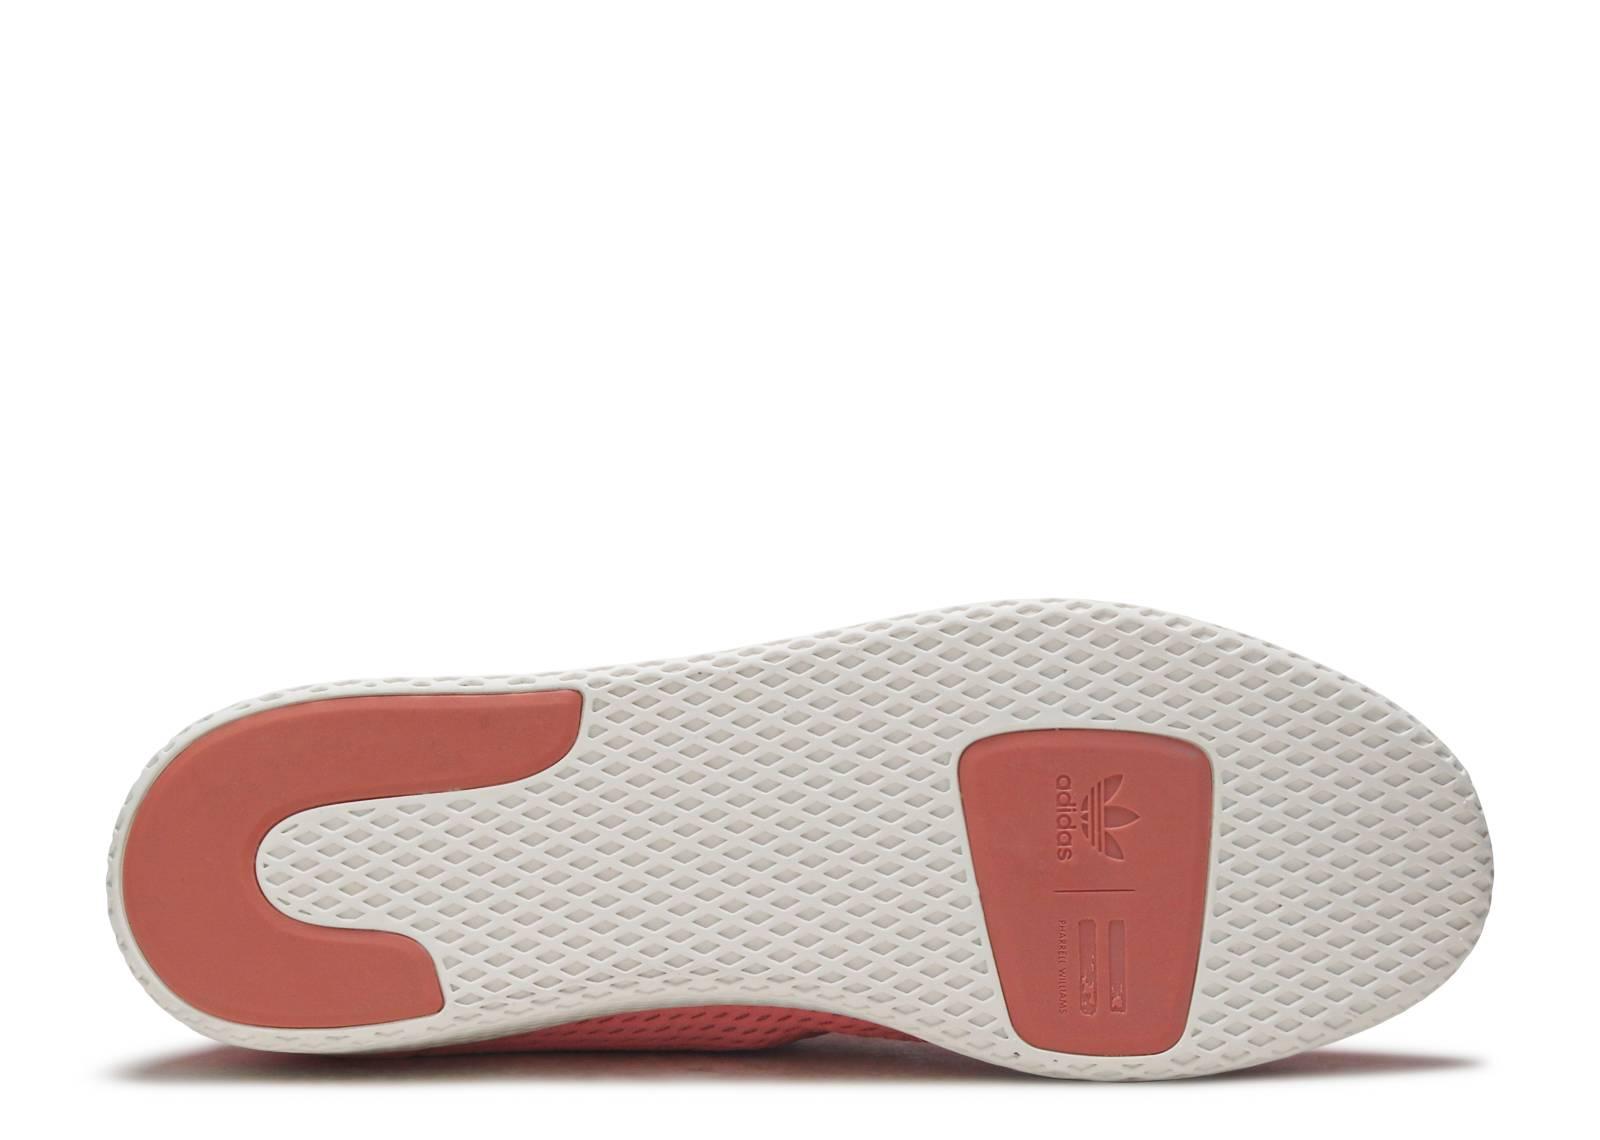 5ecebe2e2ba38 Pw Tennis Hu - Adidas - by8715 - tacros tarcos rawpin